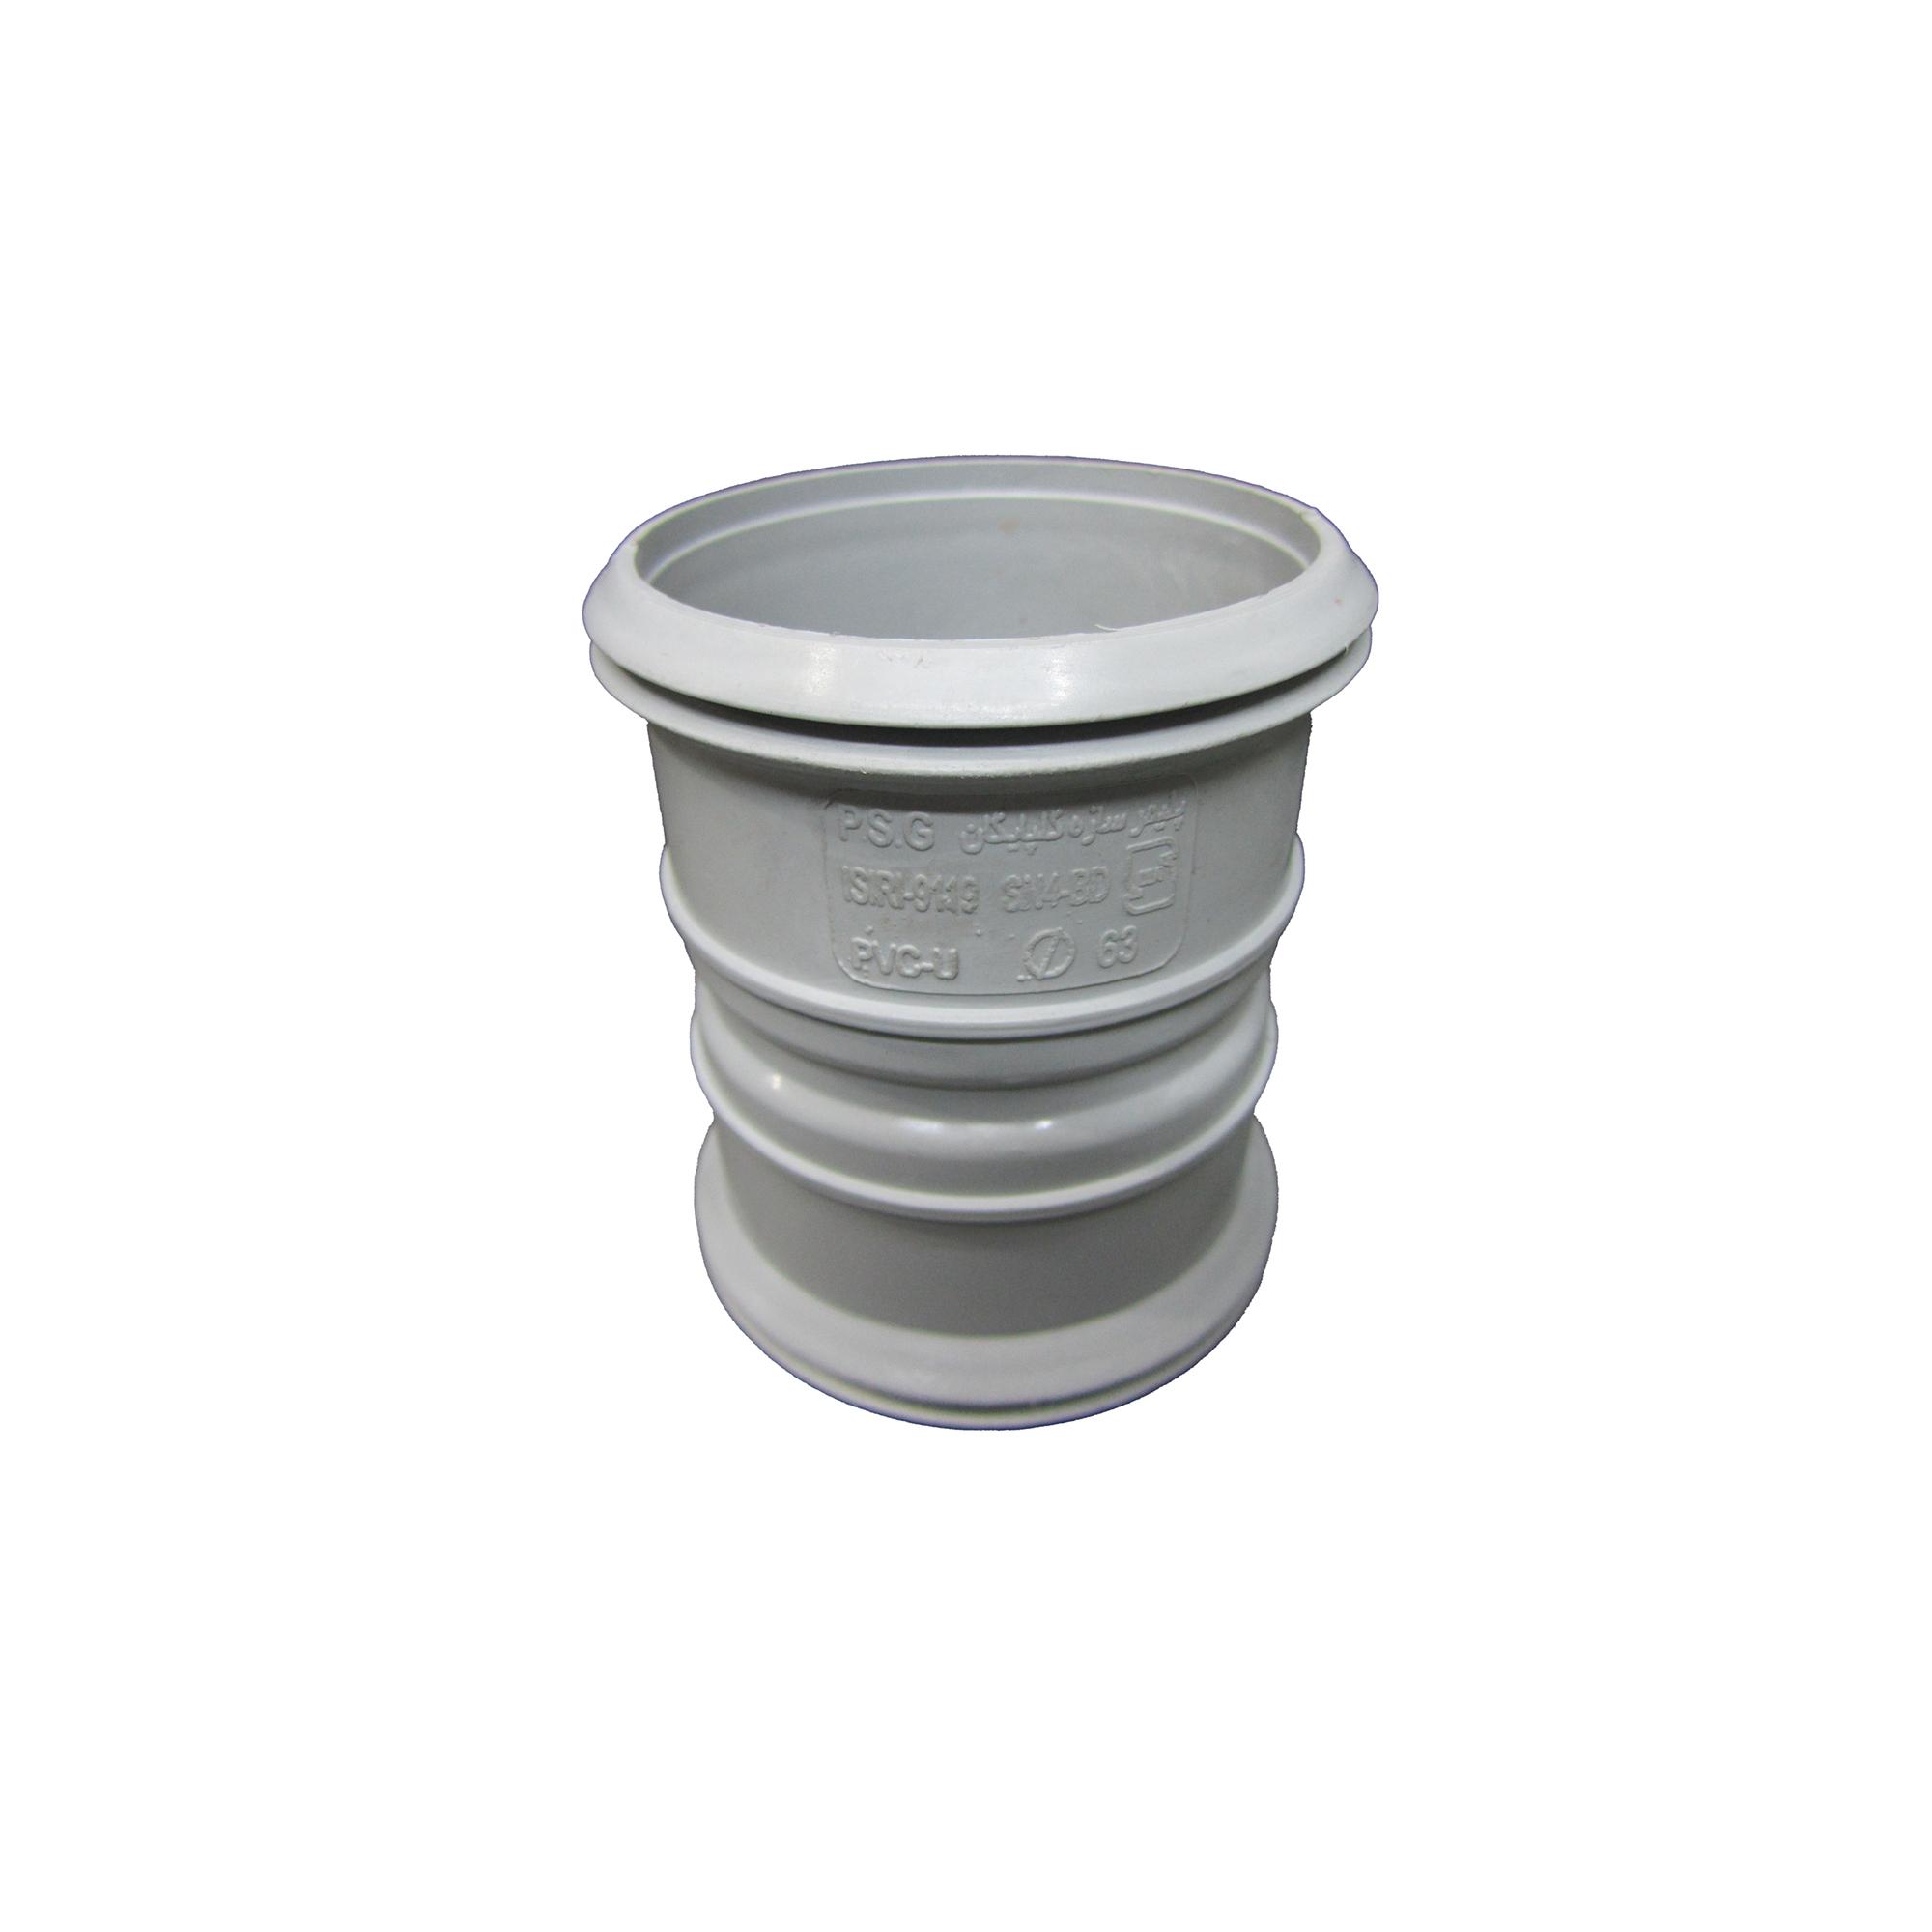 قیمت                                      اتصال بوشن پلیمر سازه گلپایگان کد ۶۳